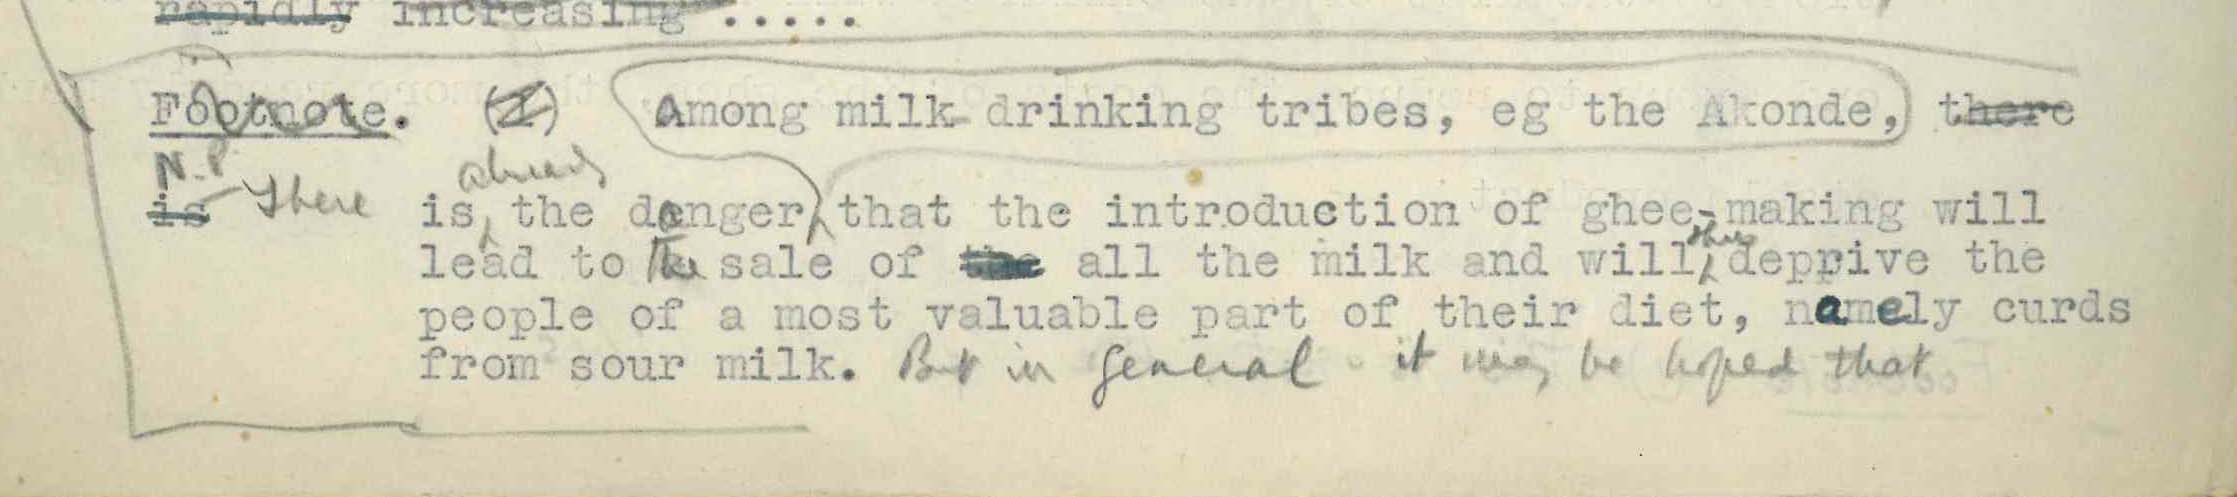 ch.2 p.8 footnote